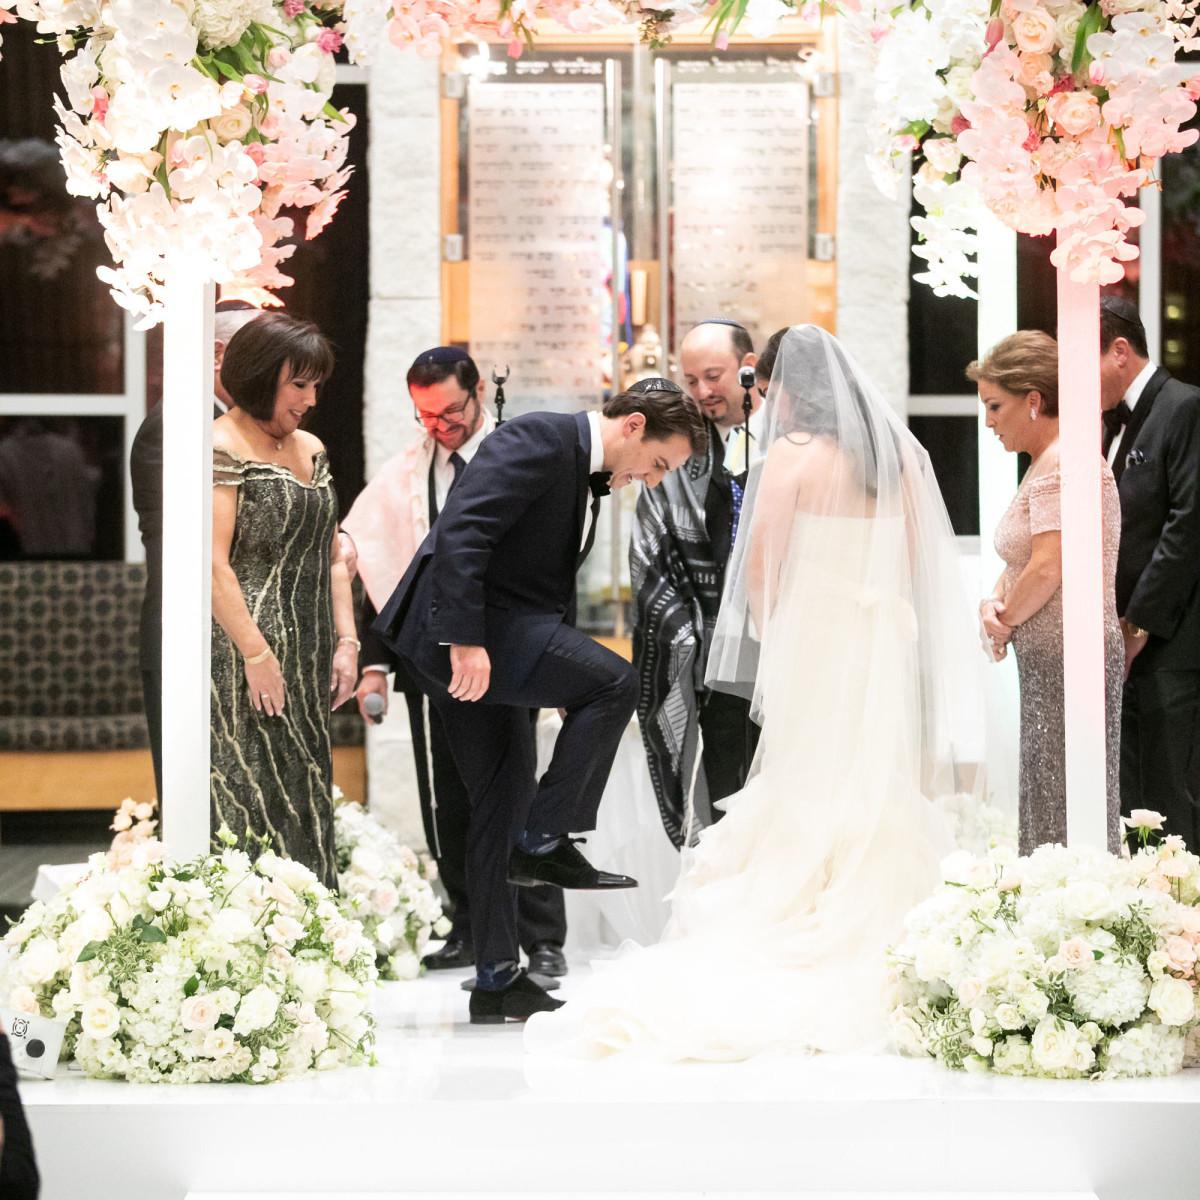 Courtney and josh wedding